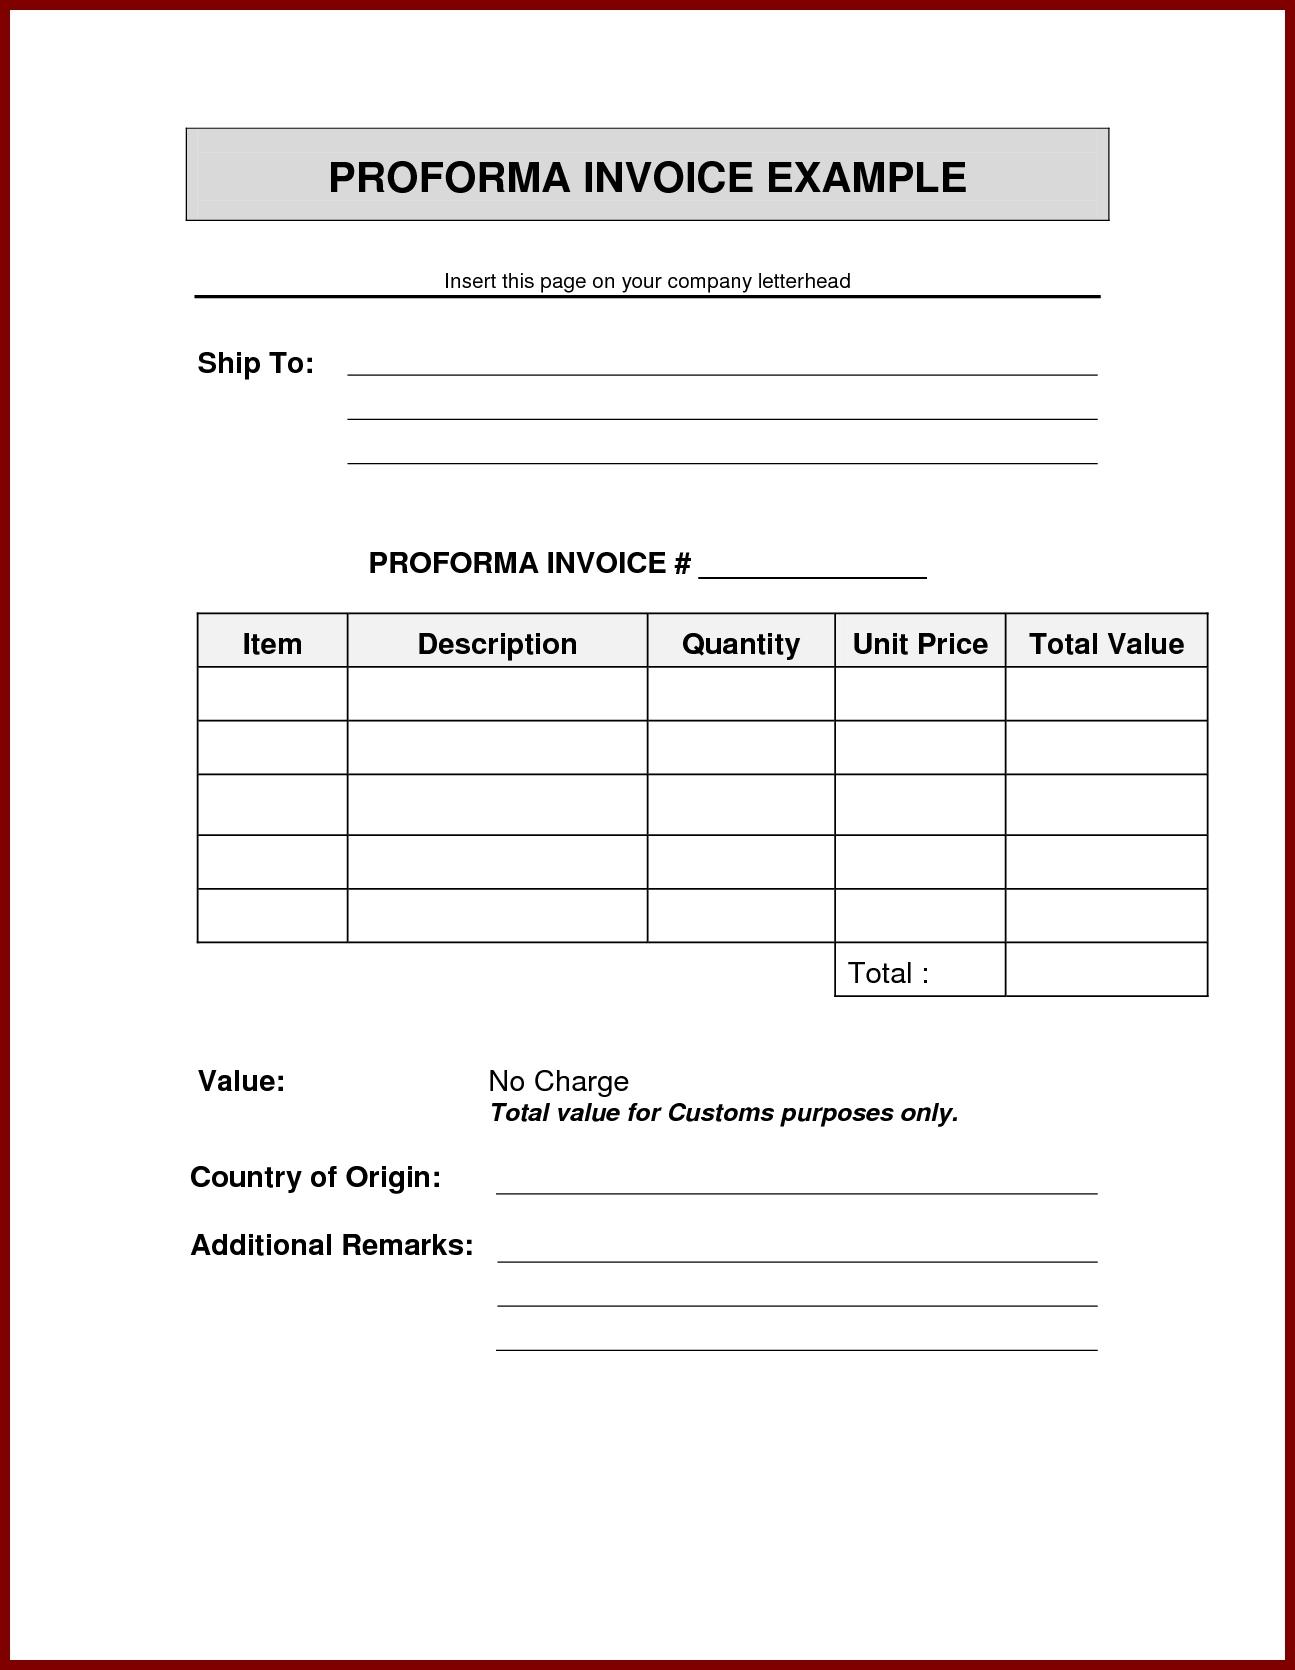 format of proforma invoice invoice template ideas 8 sample of proforma invoice template sendletters format of proforma invoice